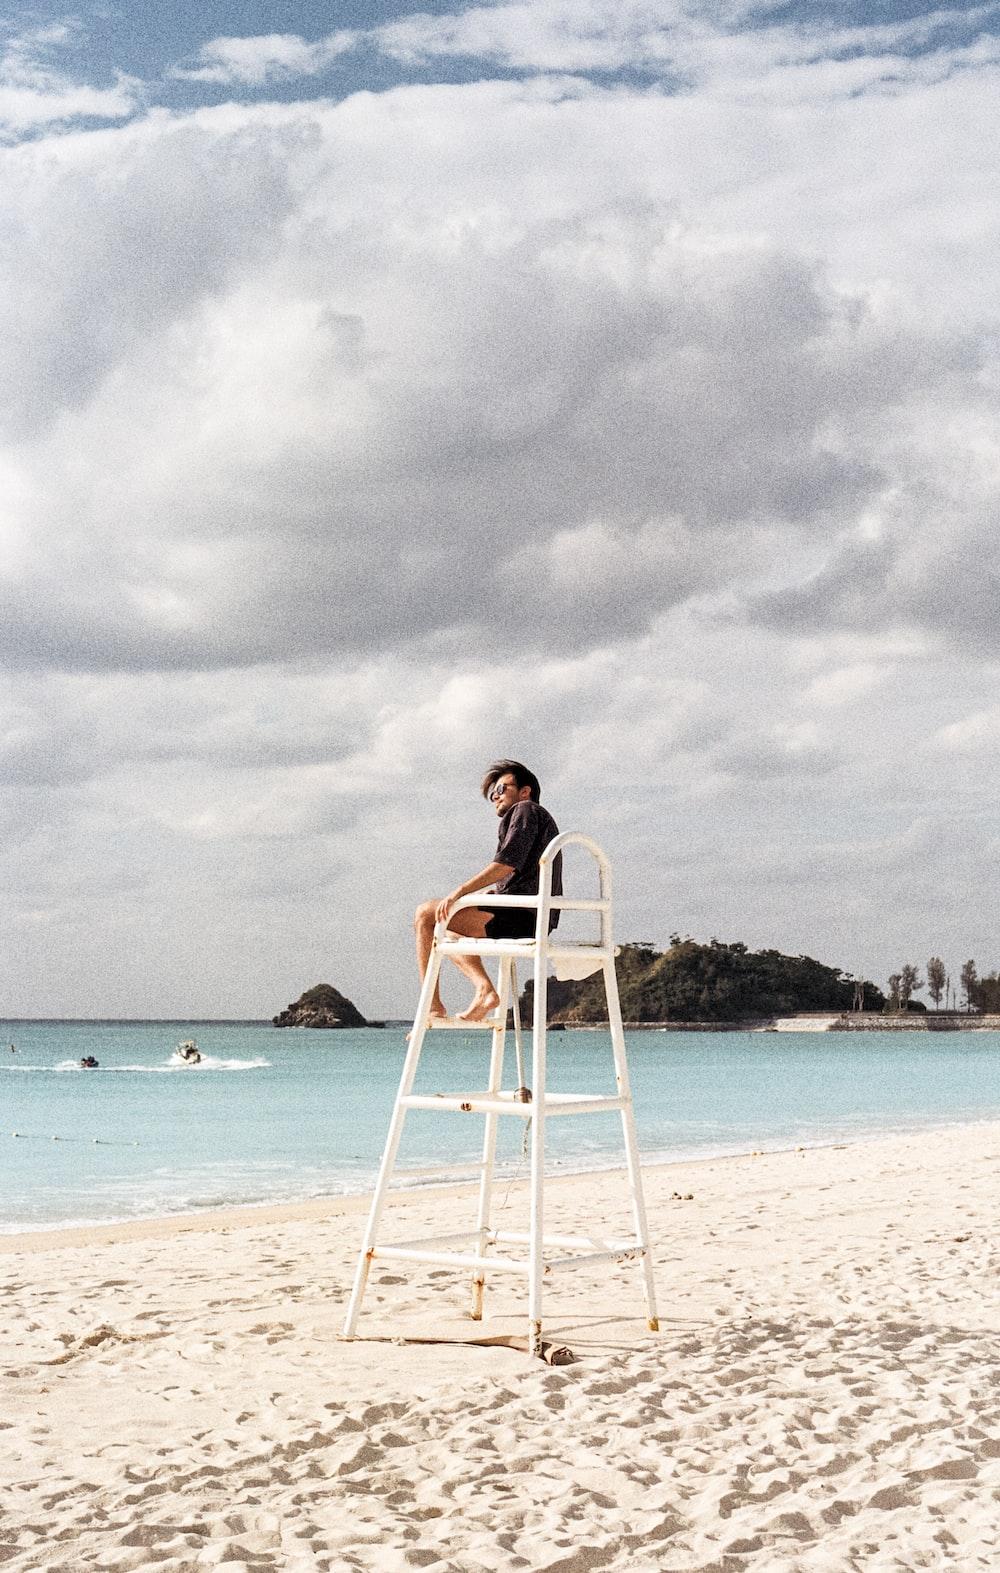 man sitting on lifeguard's chair